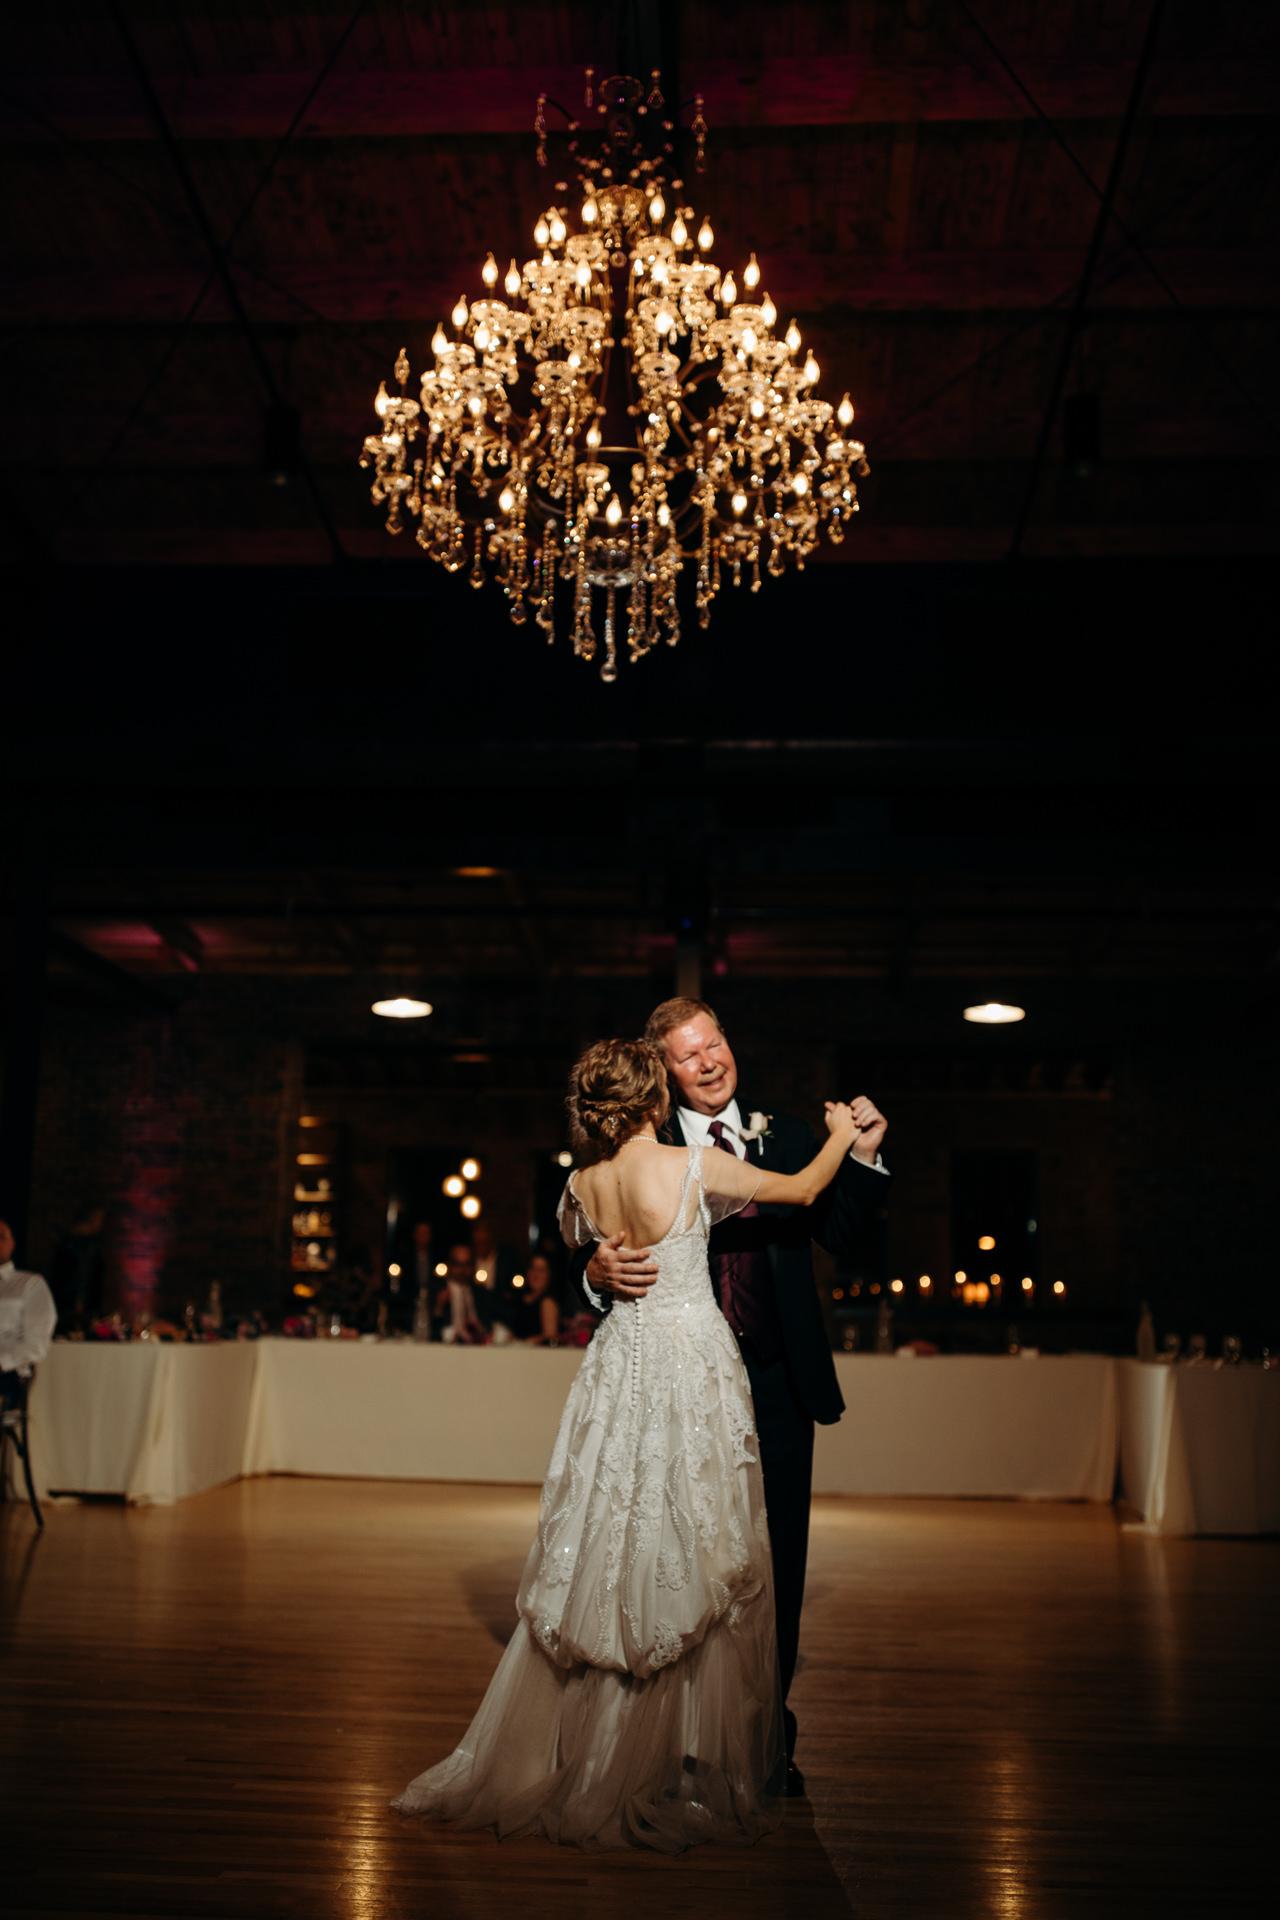 Armory wedding south bend grant beachy photography elkhart goshen -077.jpg